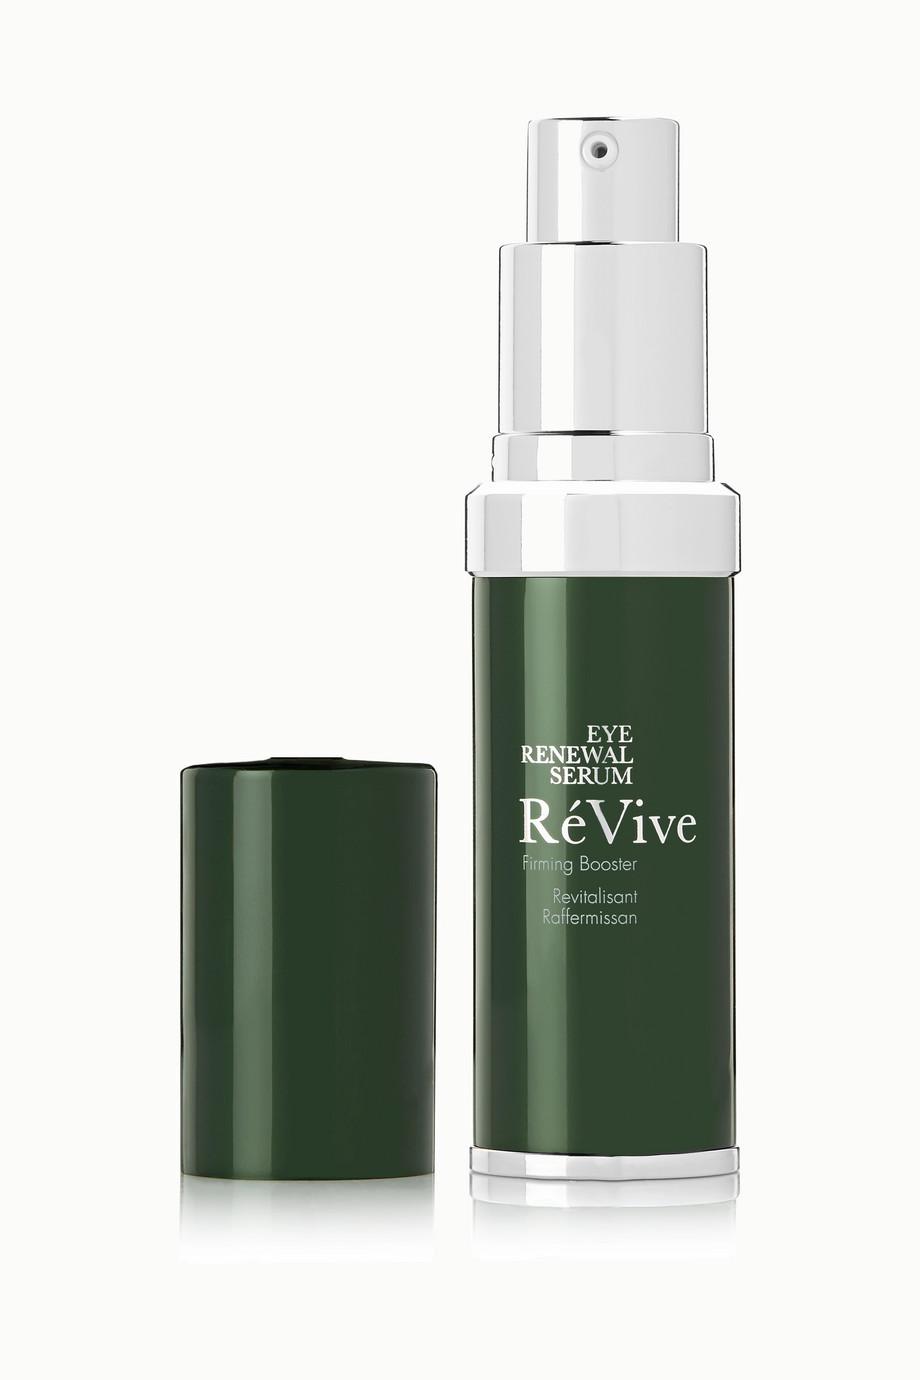 RéVive Eye Renewal Serum, 15ml